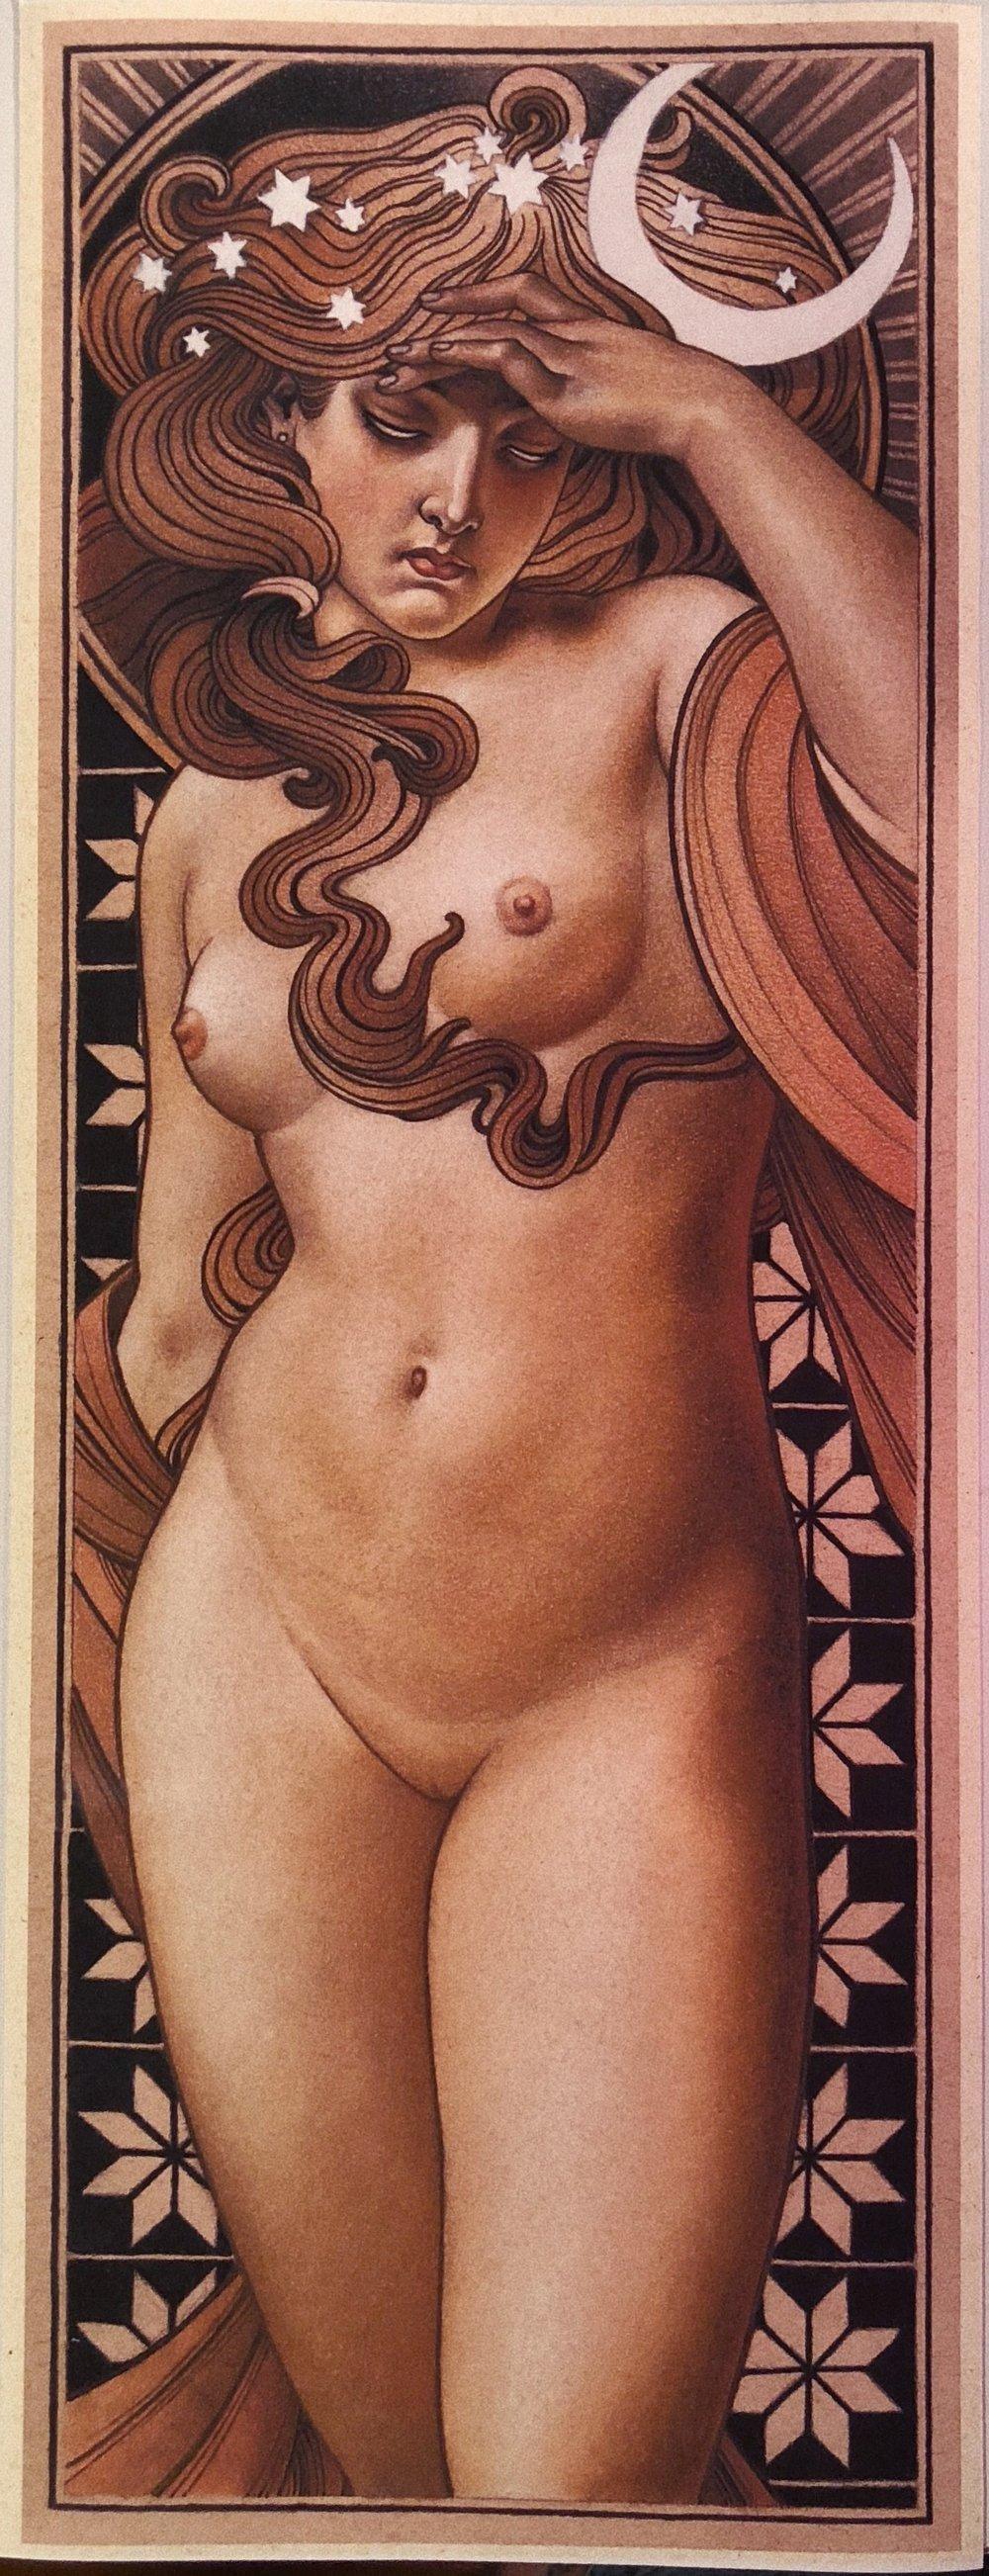 Image of Venus